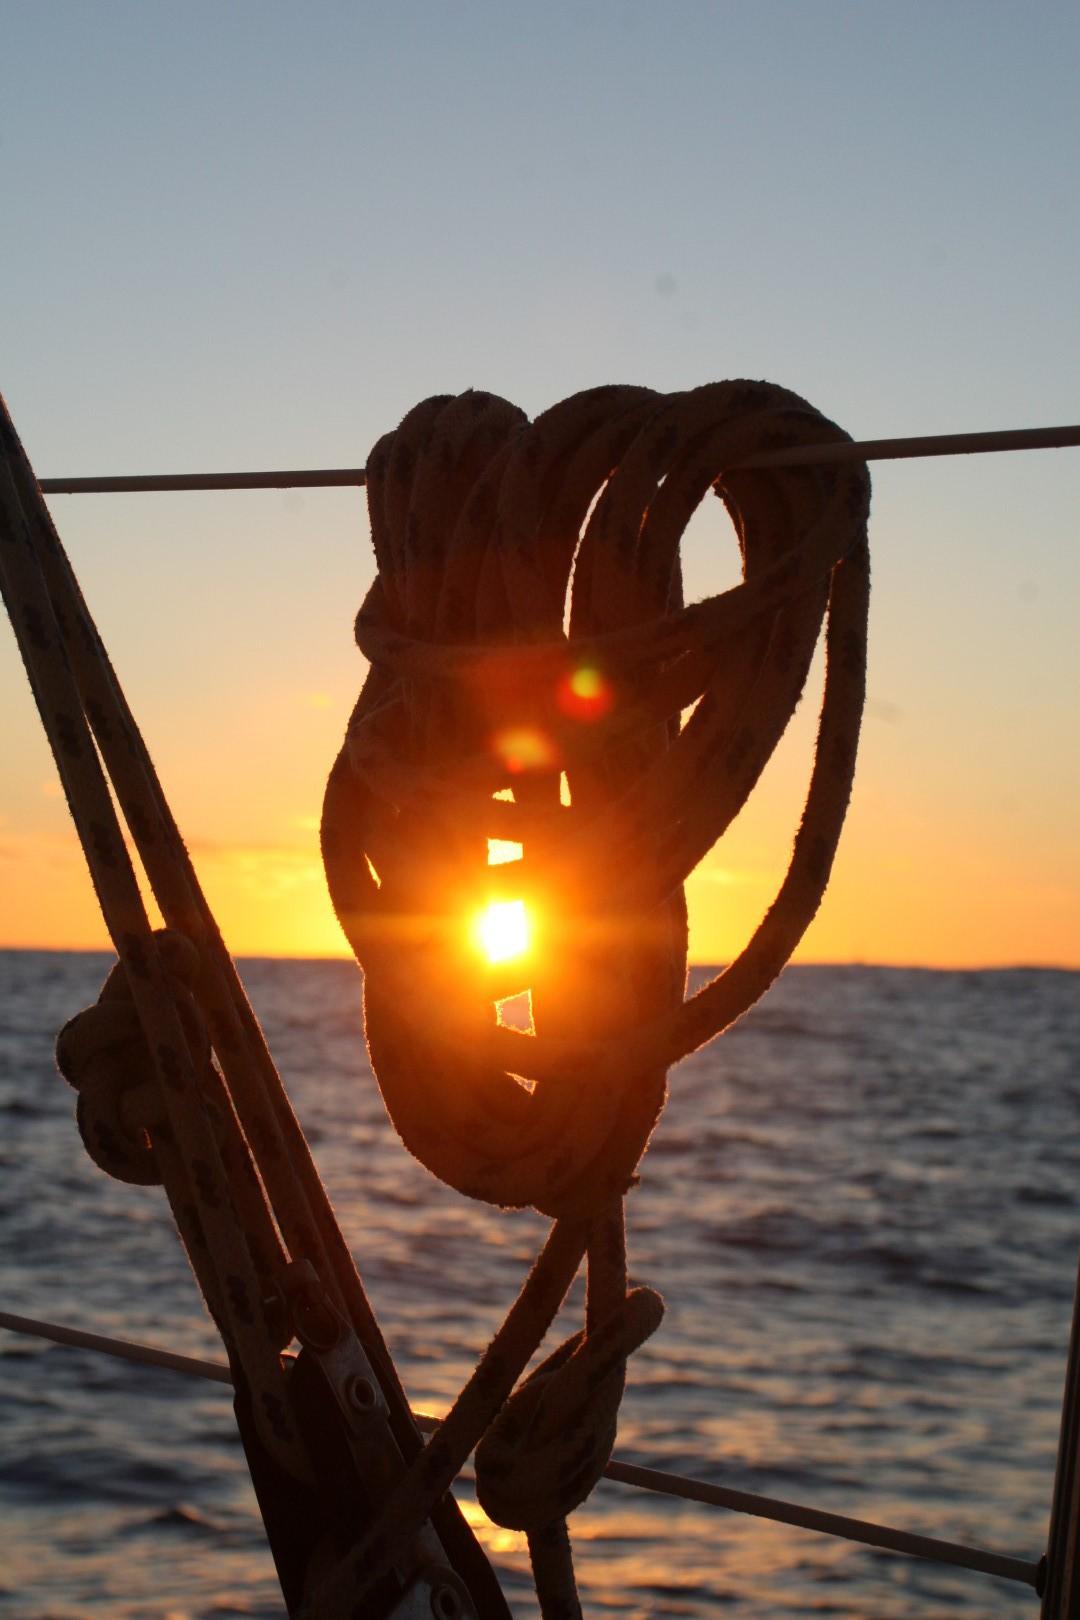 Sonnenuntergang bei ruhiger See